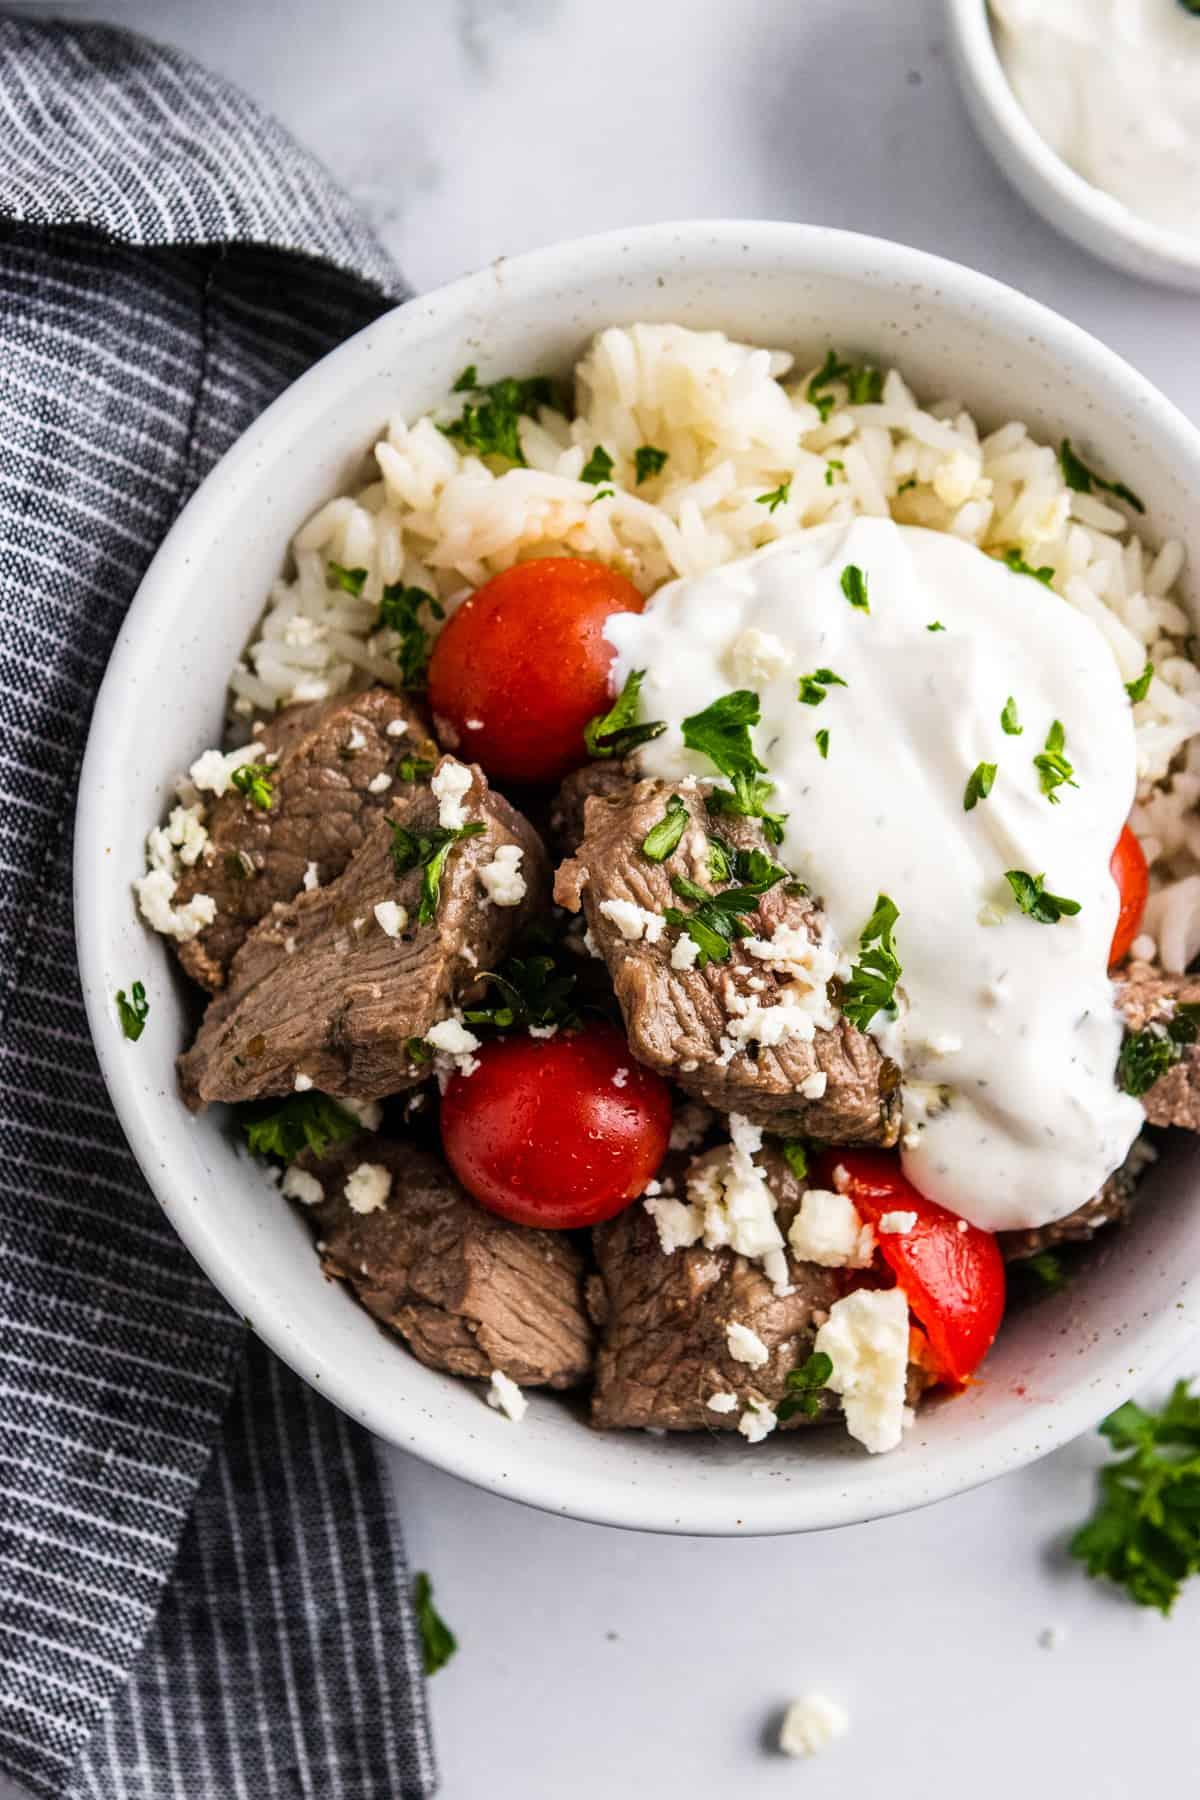 Rice bowl with Mediterranean steak bites and yogurt sauce.